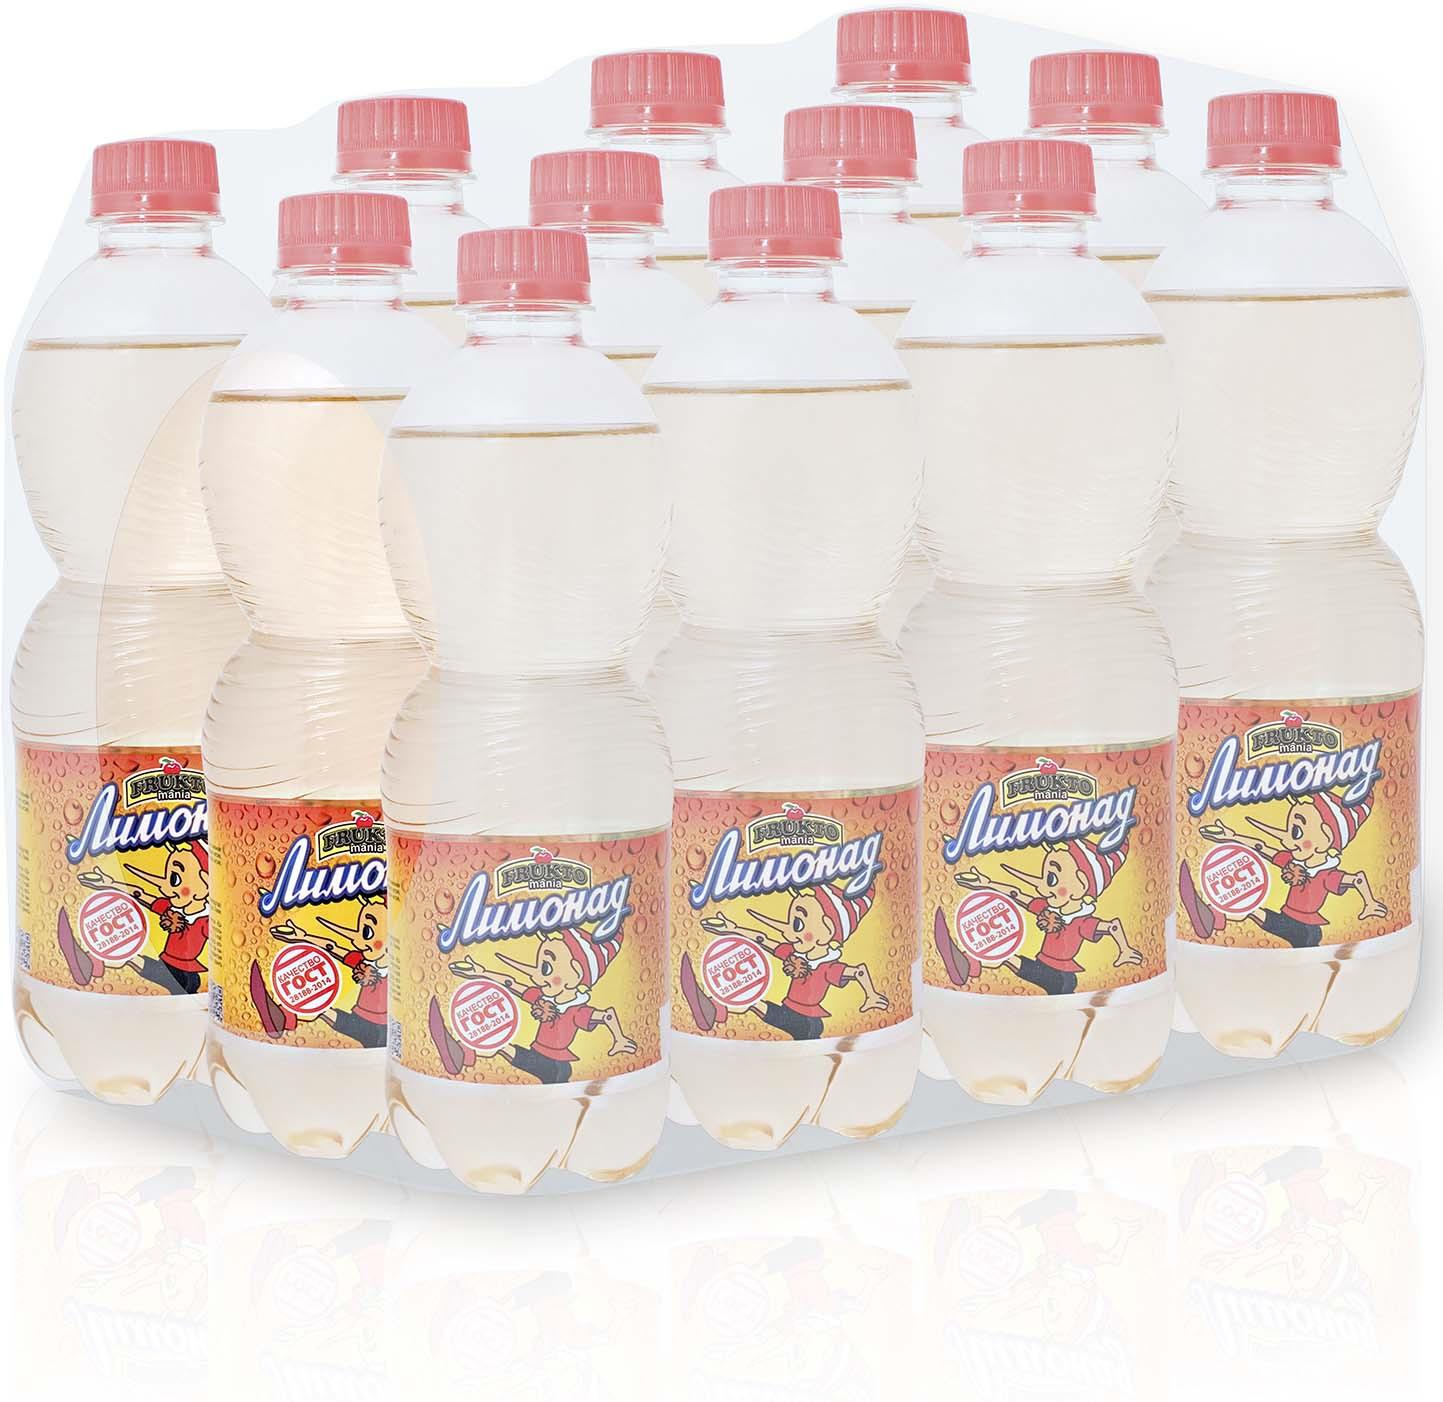 Лимонад Fruktomania, лимонад оригинальный, 12 шт по 0,5 л vesko cola лимонад 0 5 л